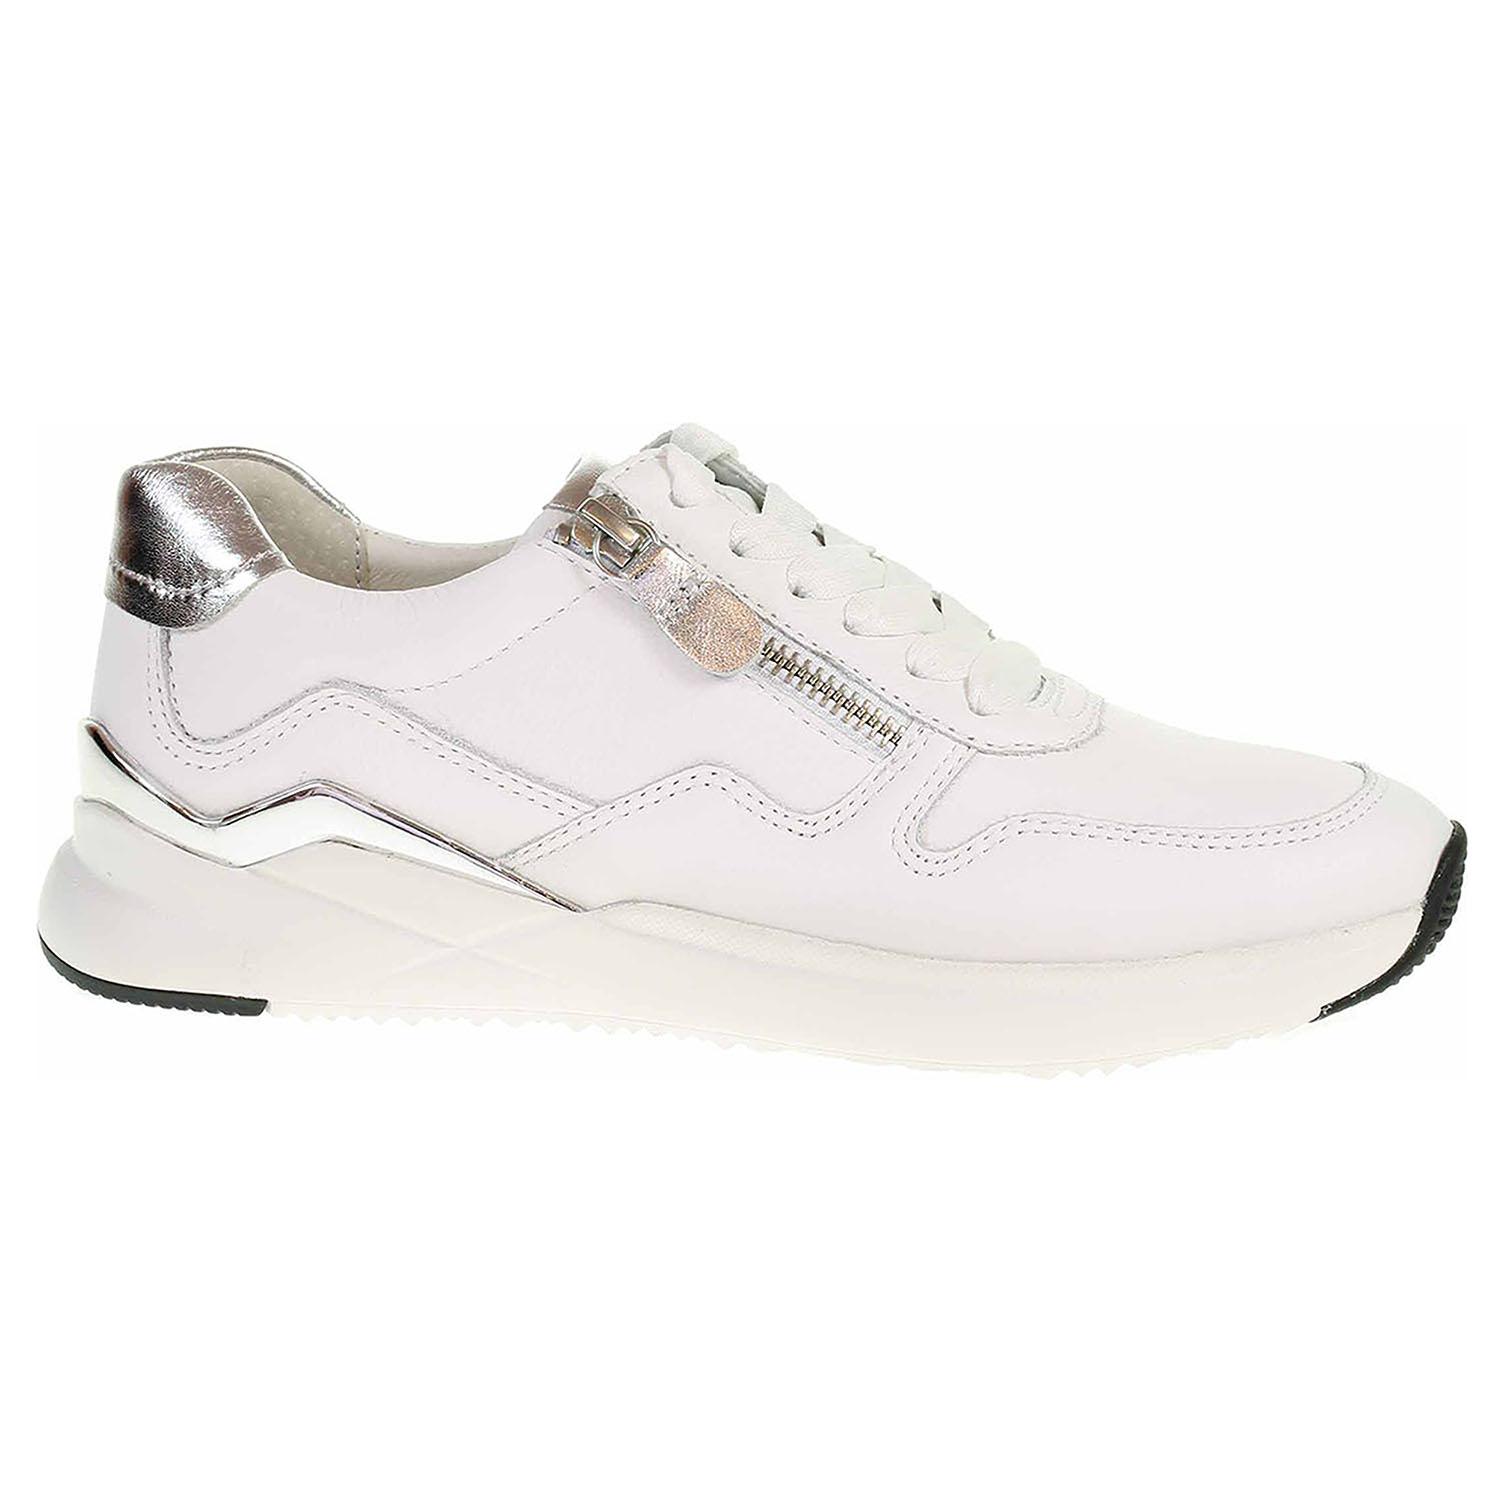 Dámská obuv Gabor 43.480.21 weiss-silber 43.480.21 38